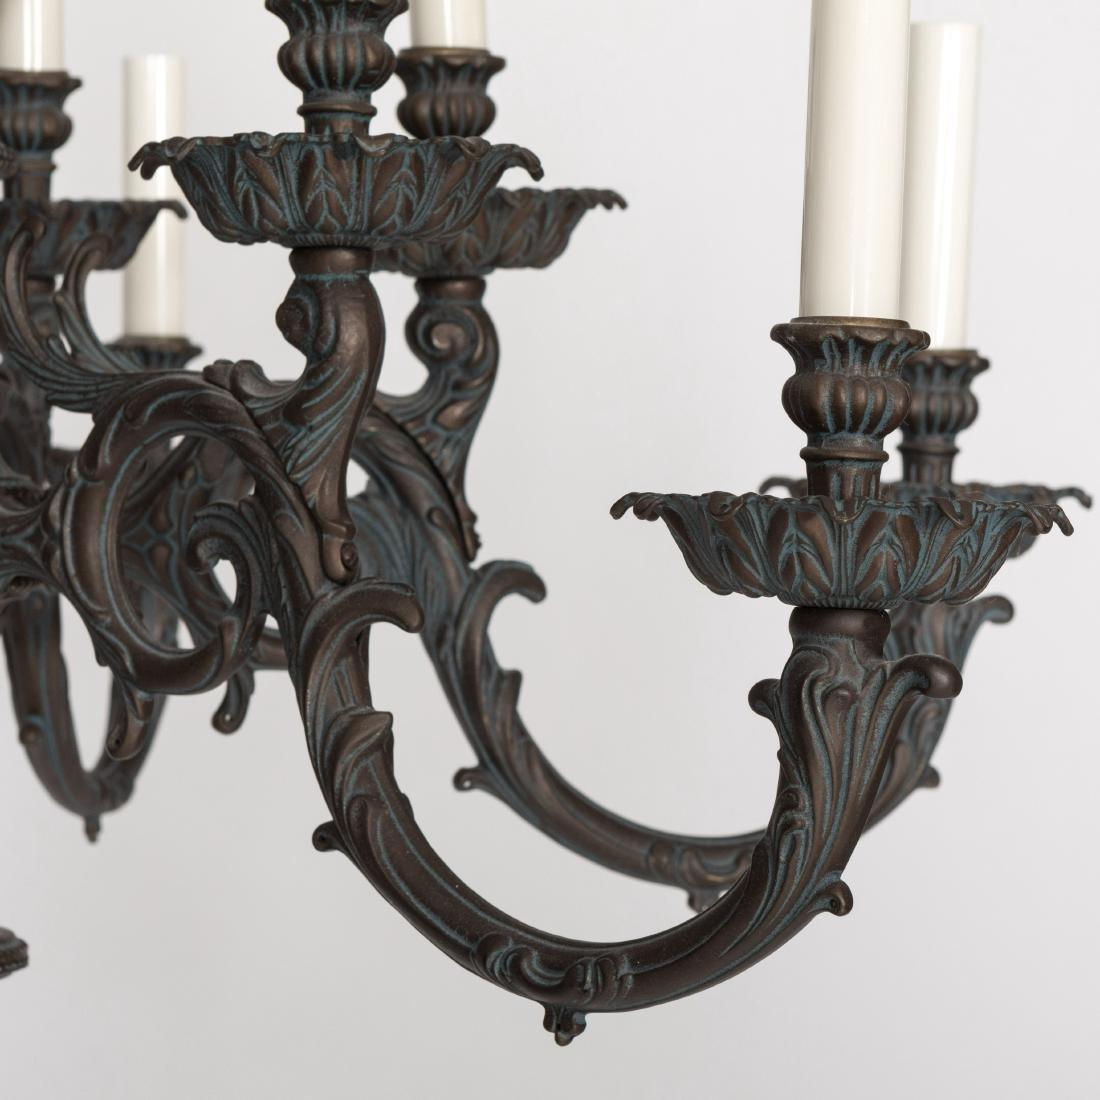 Rococo Style Iron Chandelier - 3